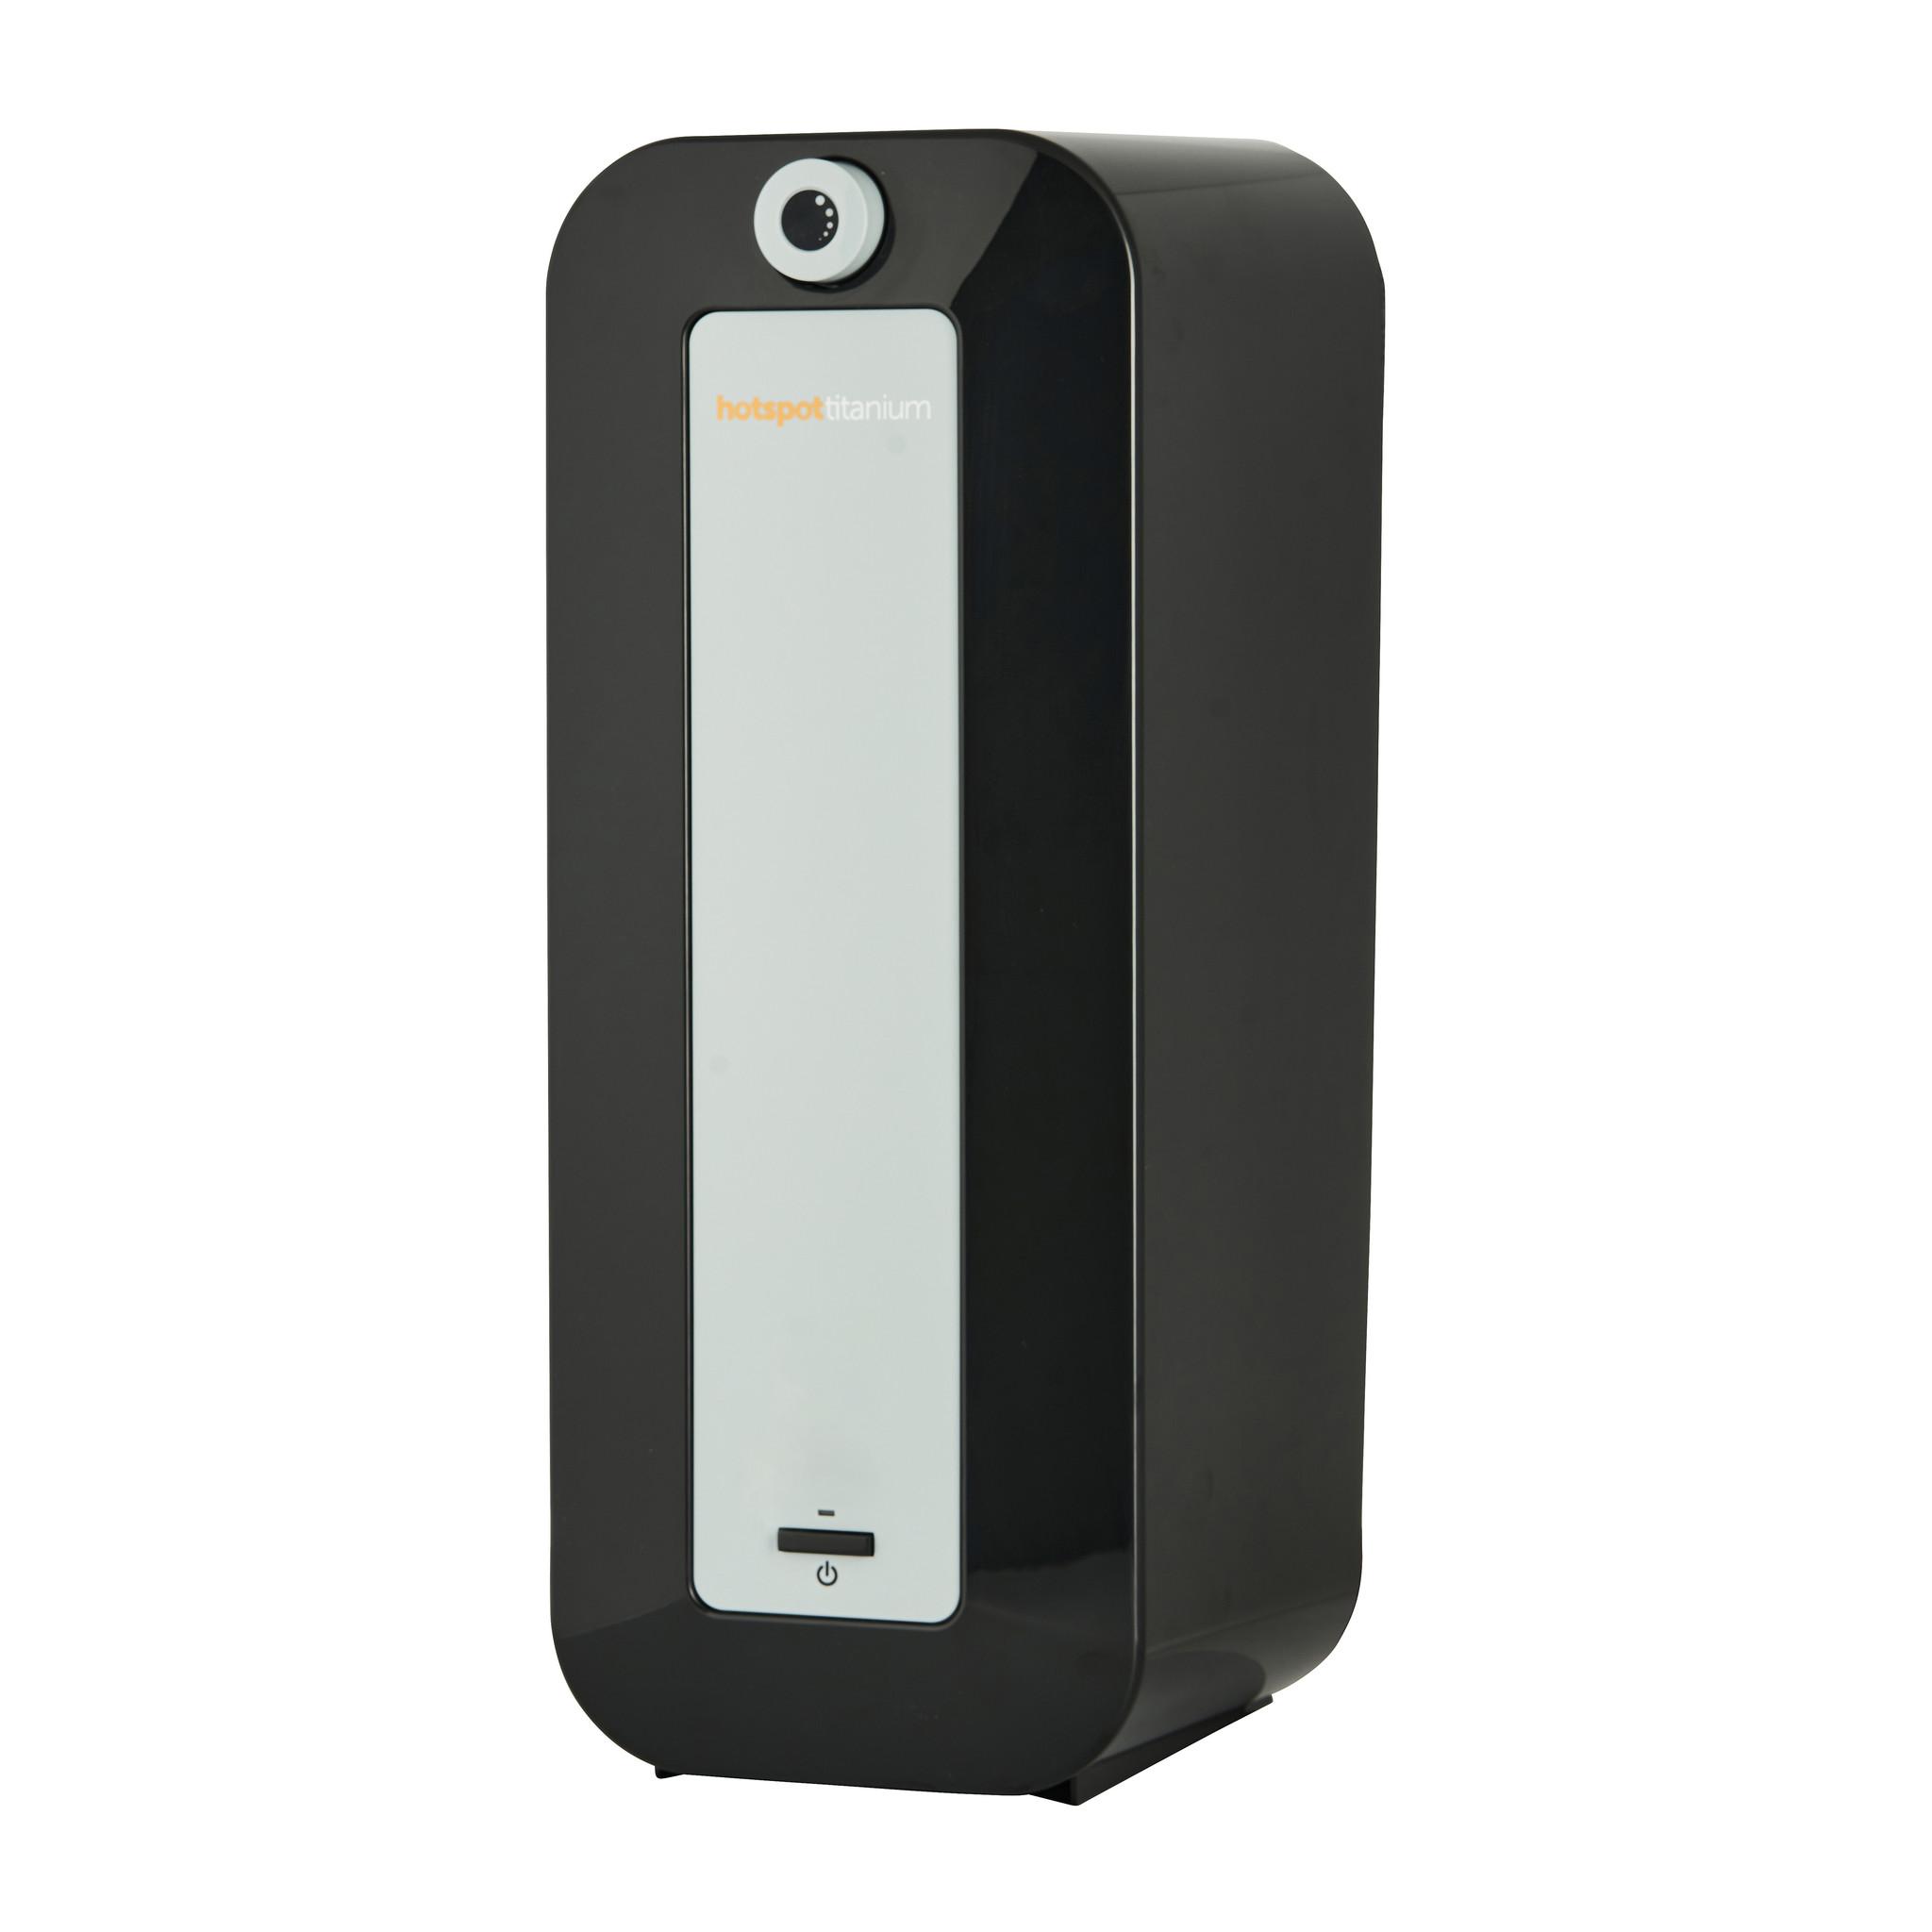 HotSpot Titanium Calisto Eco Premium Polished Chrome Tap